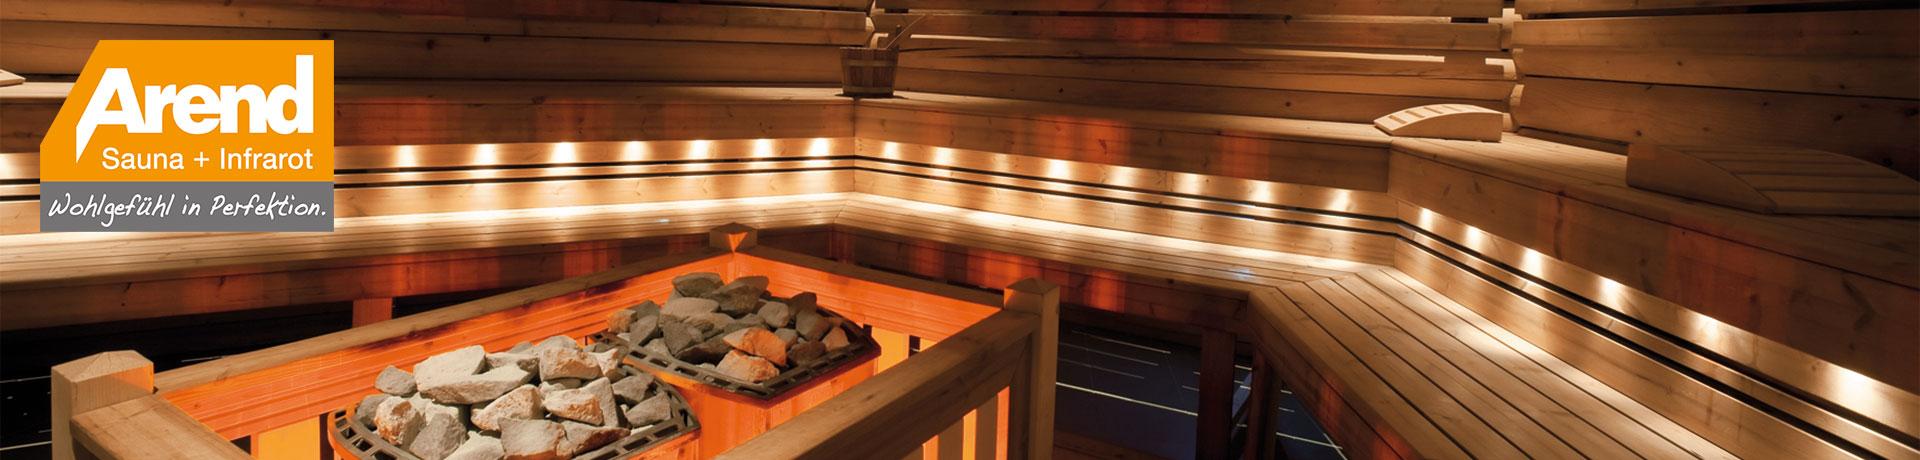 arend-sauna-gewerbe-sauna-profi-page-banner